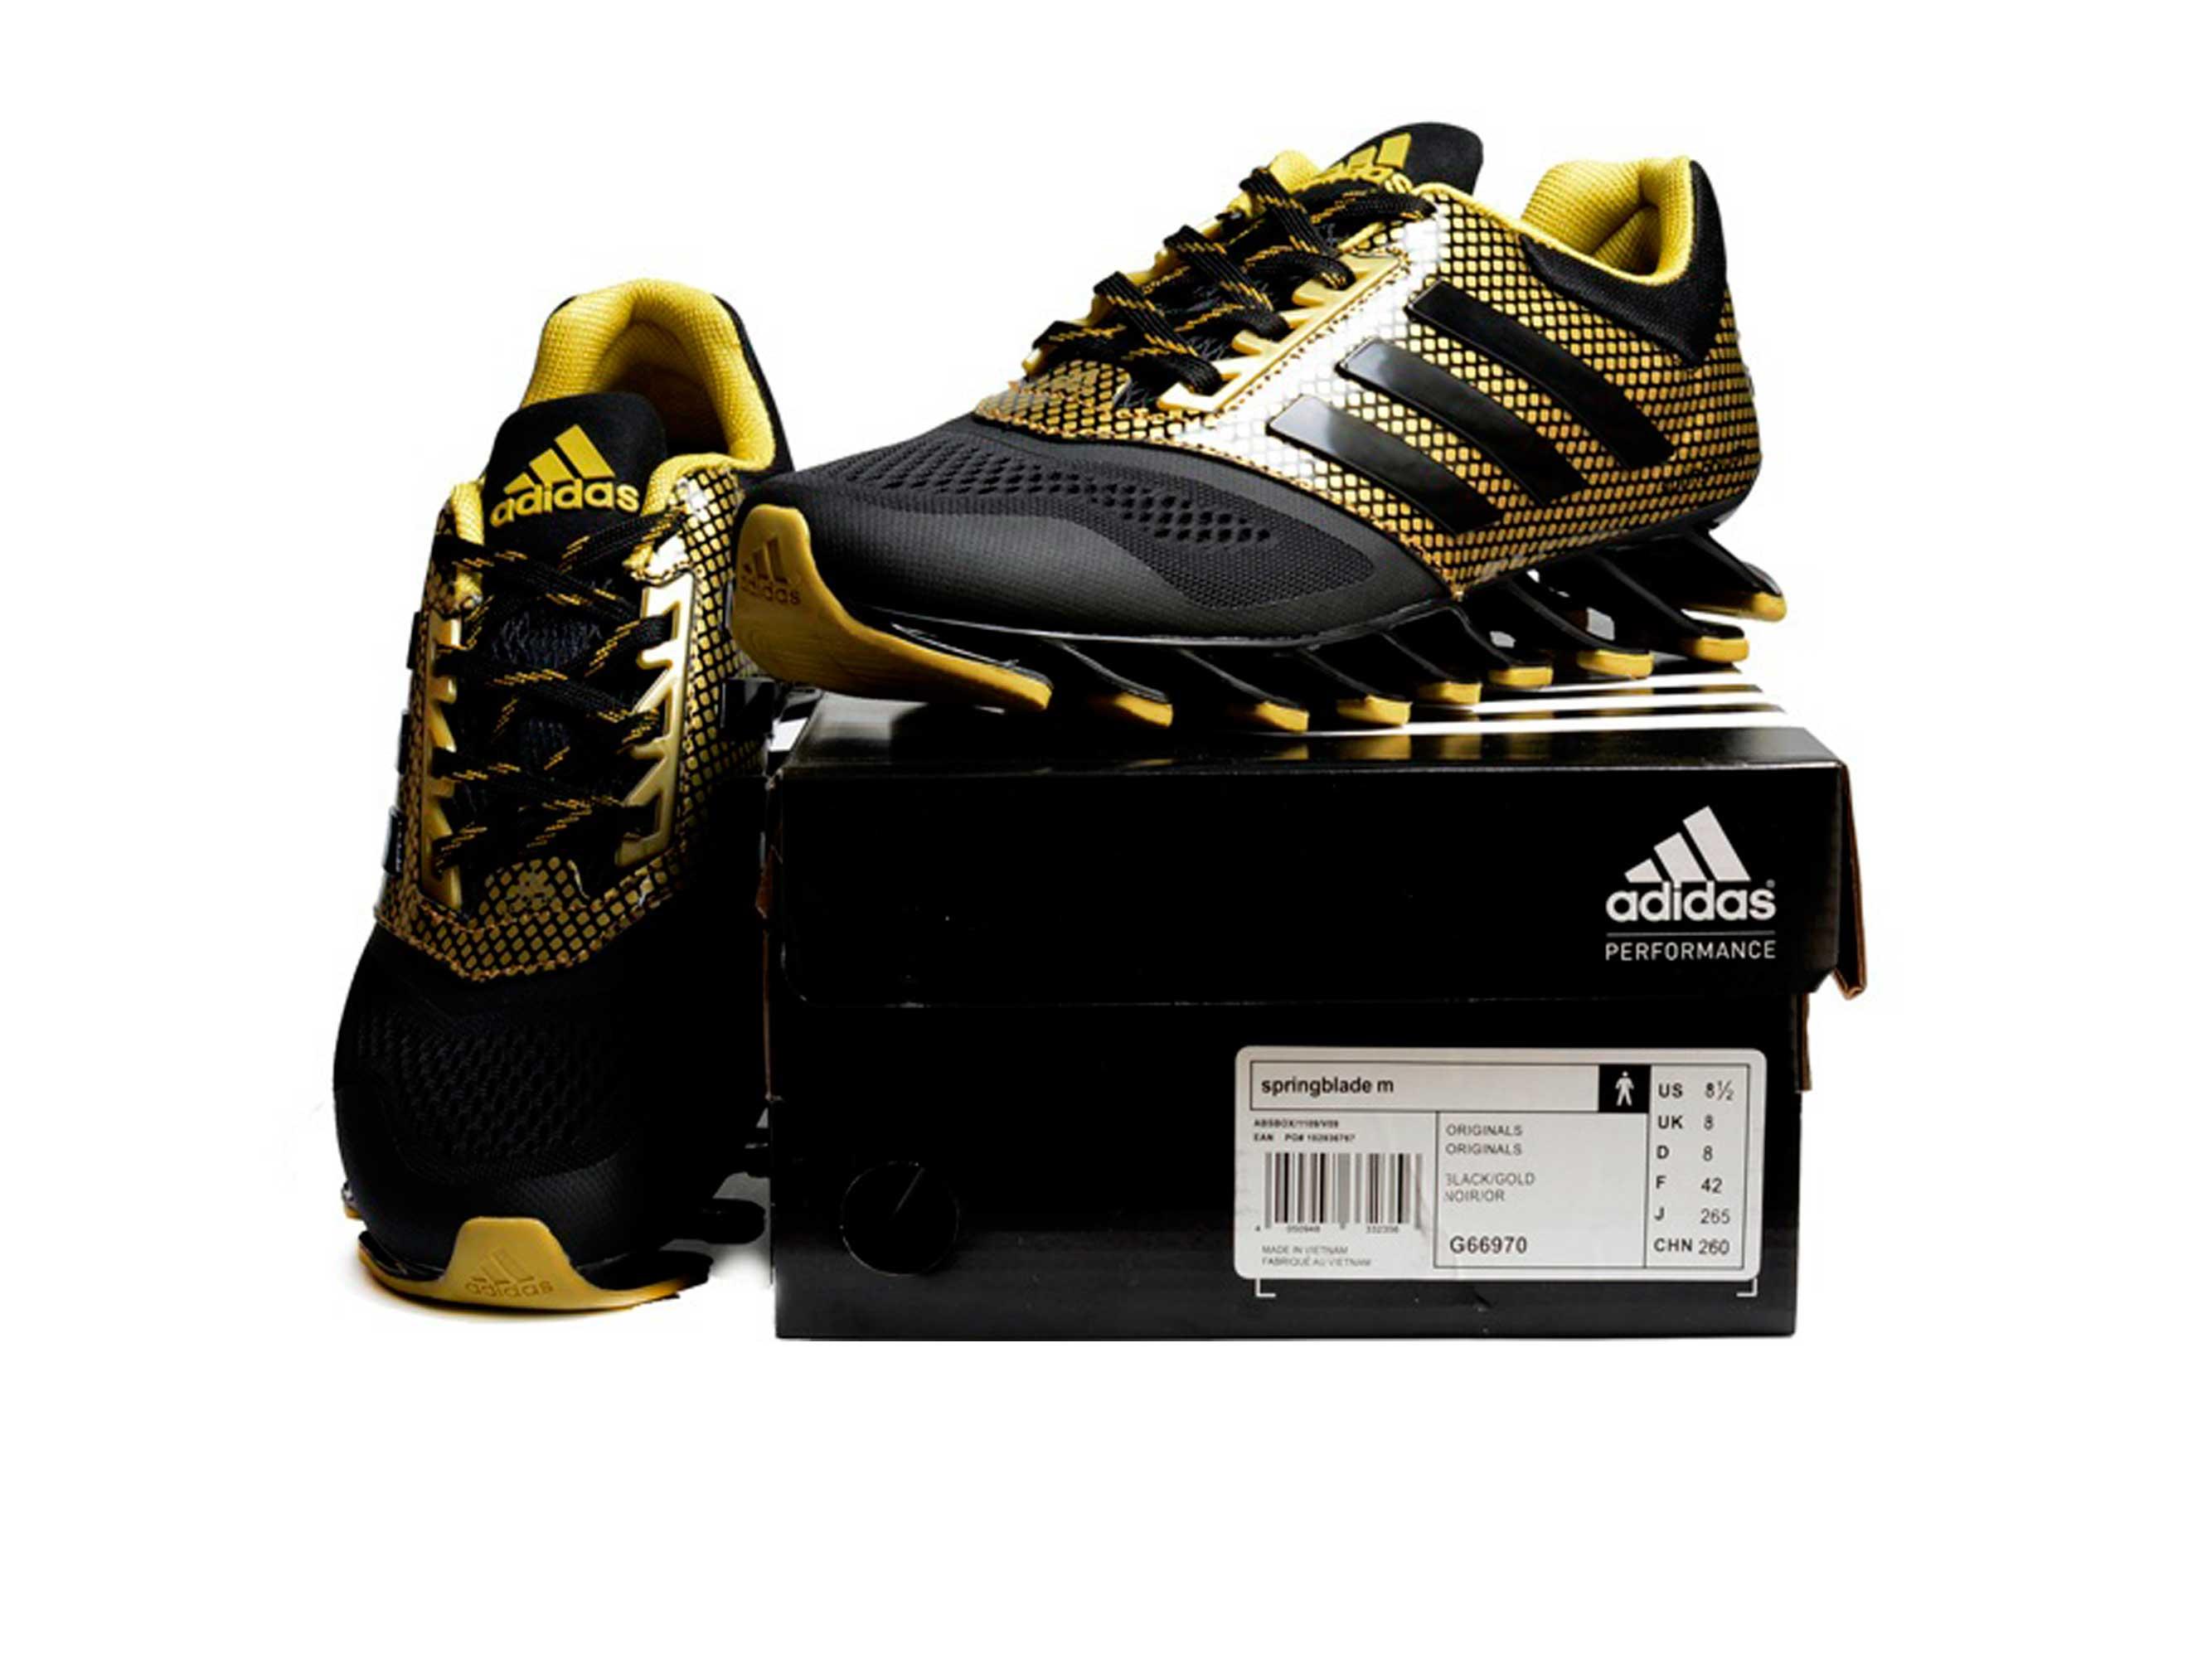 half off 5bc7b c347d adidas springblade black and gold